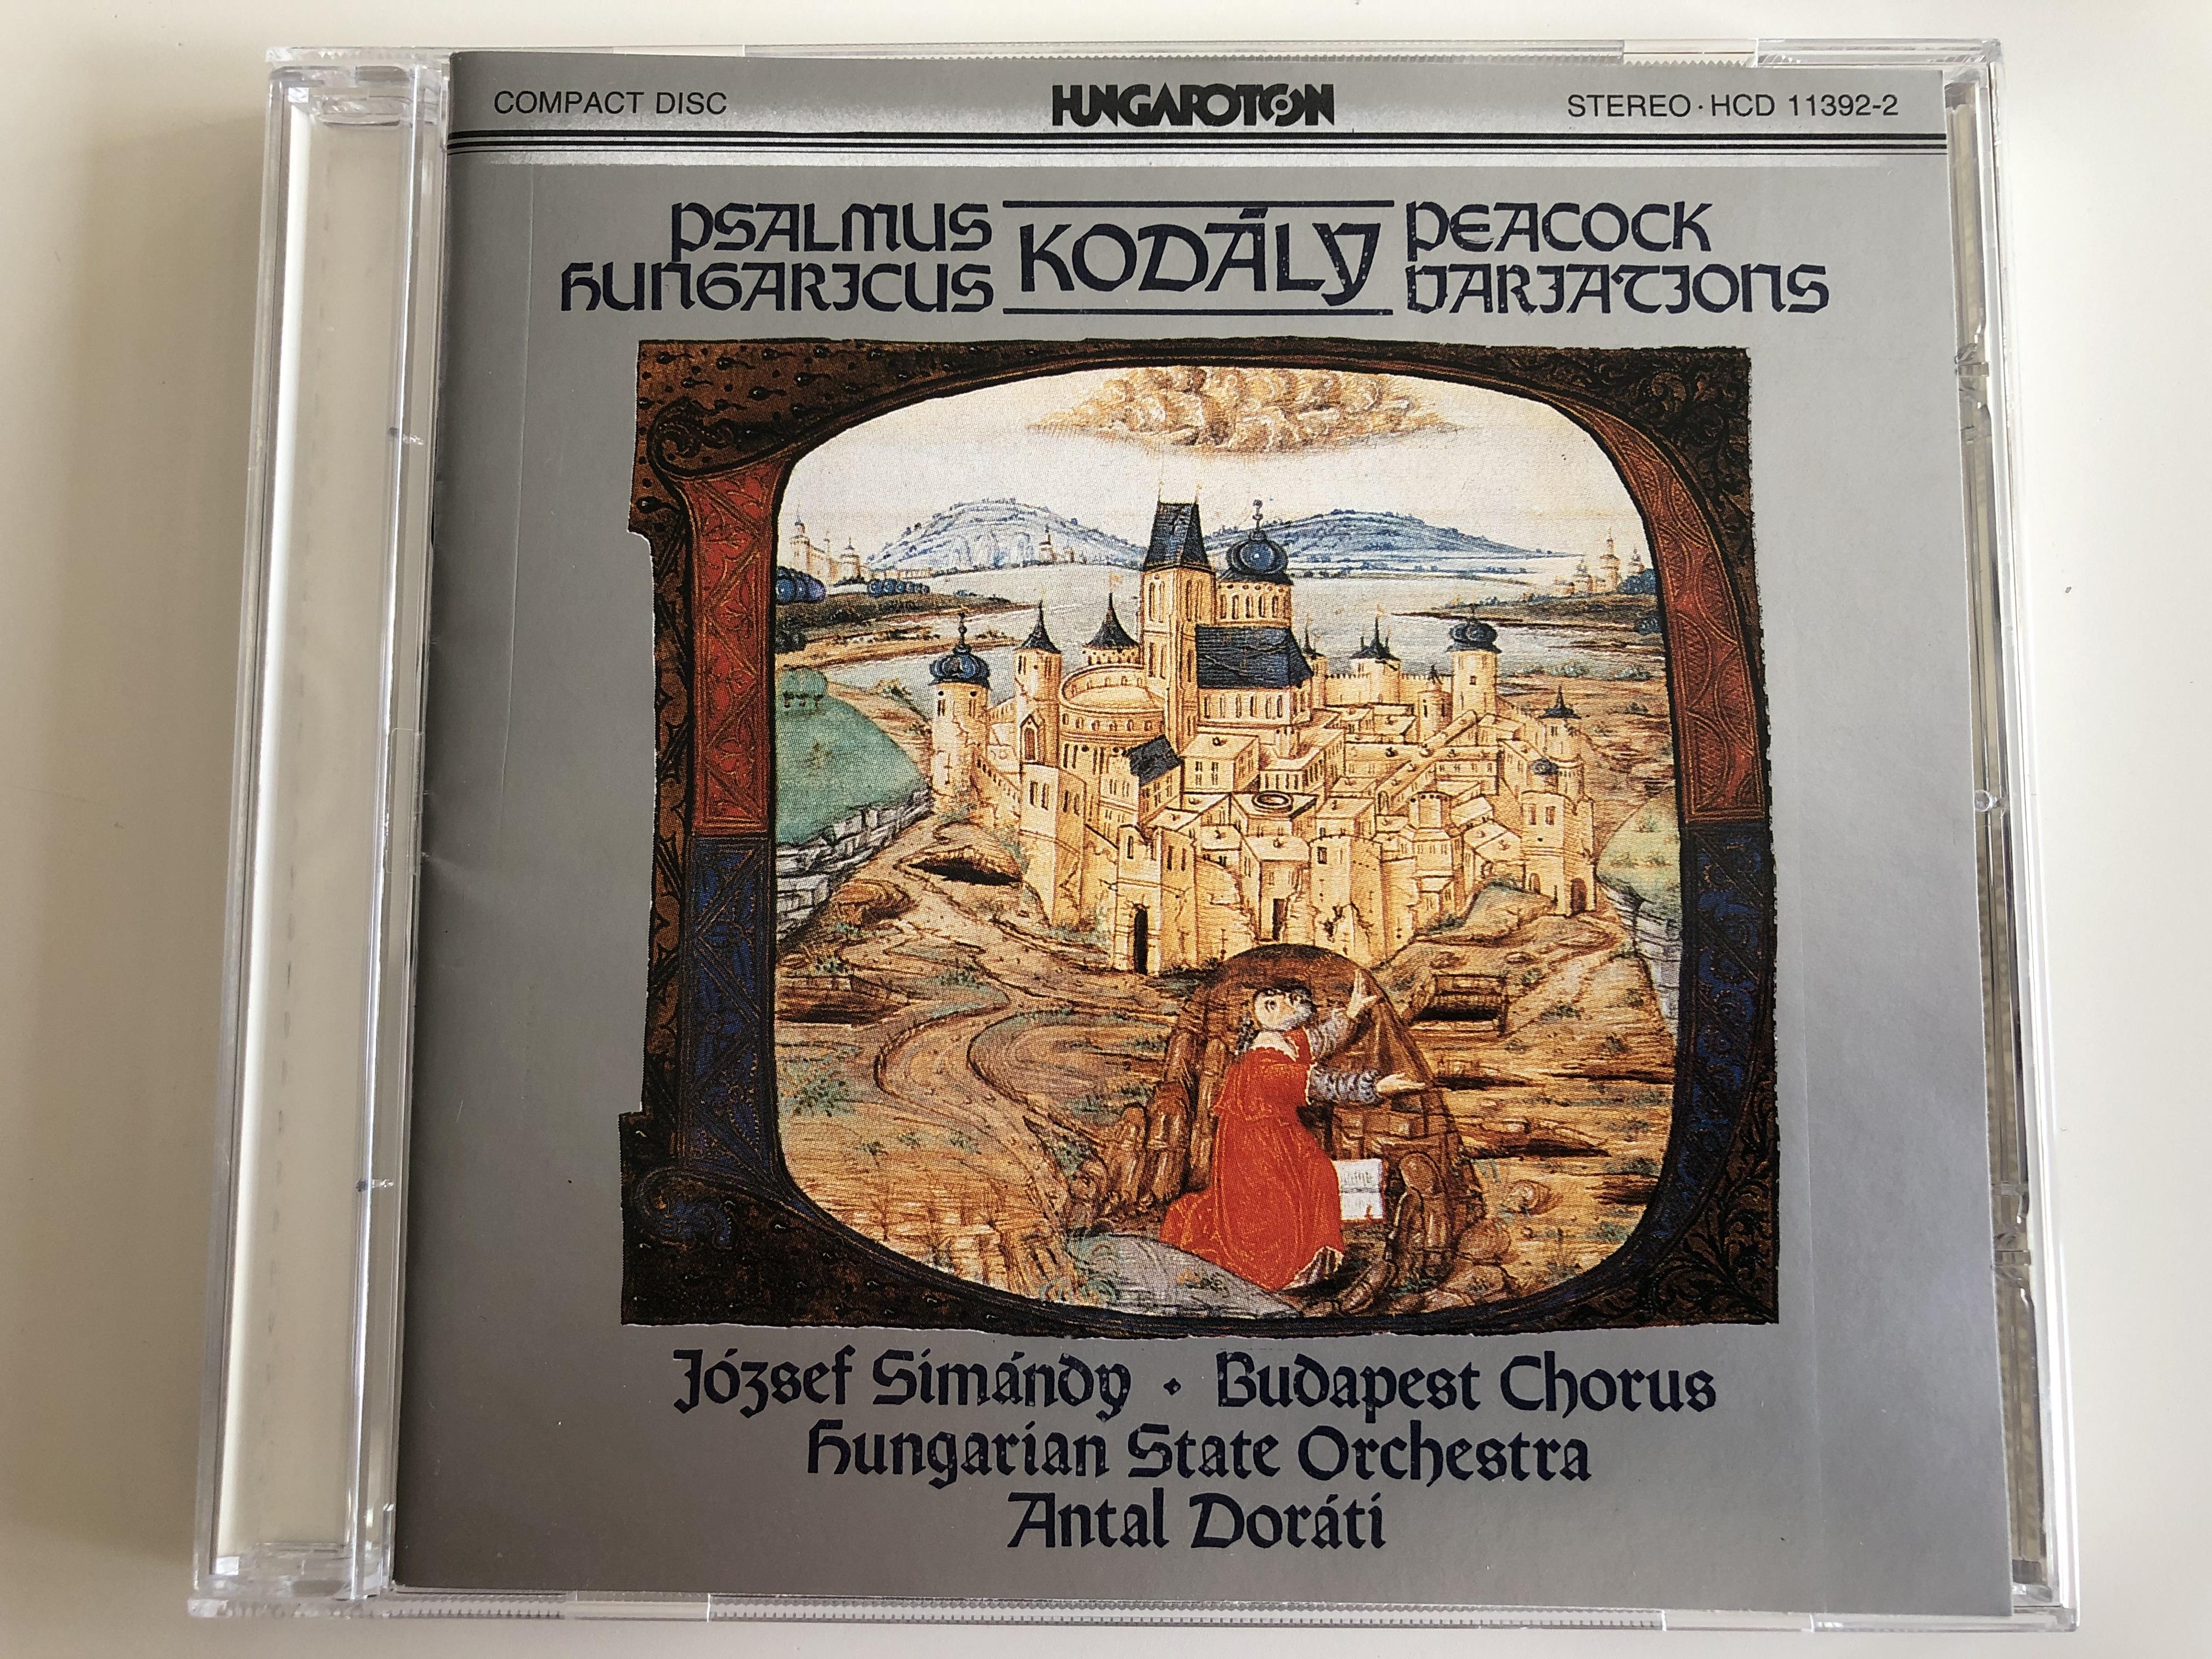 kod-ly-psalmus-hungaricus-peacock-variations-j-zsef-sim-ndy-budapest-chorus-hungarian-state-orchestra-antal-dorati-hungaroton-audio-cd-1986-stereo-hcd-11392-2-1-.jpg